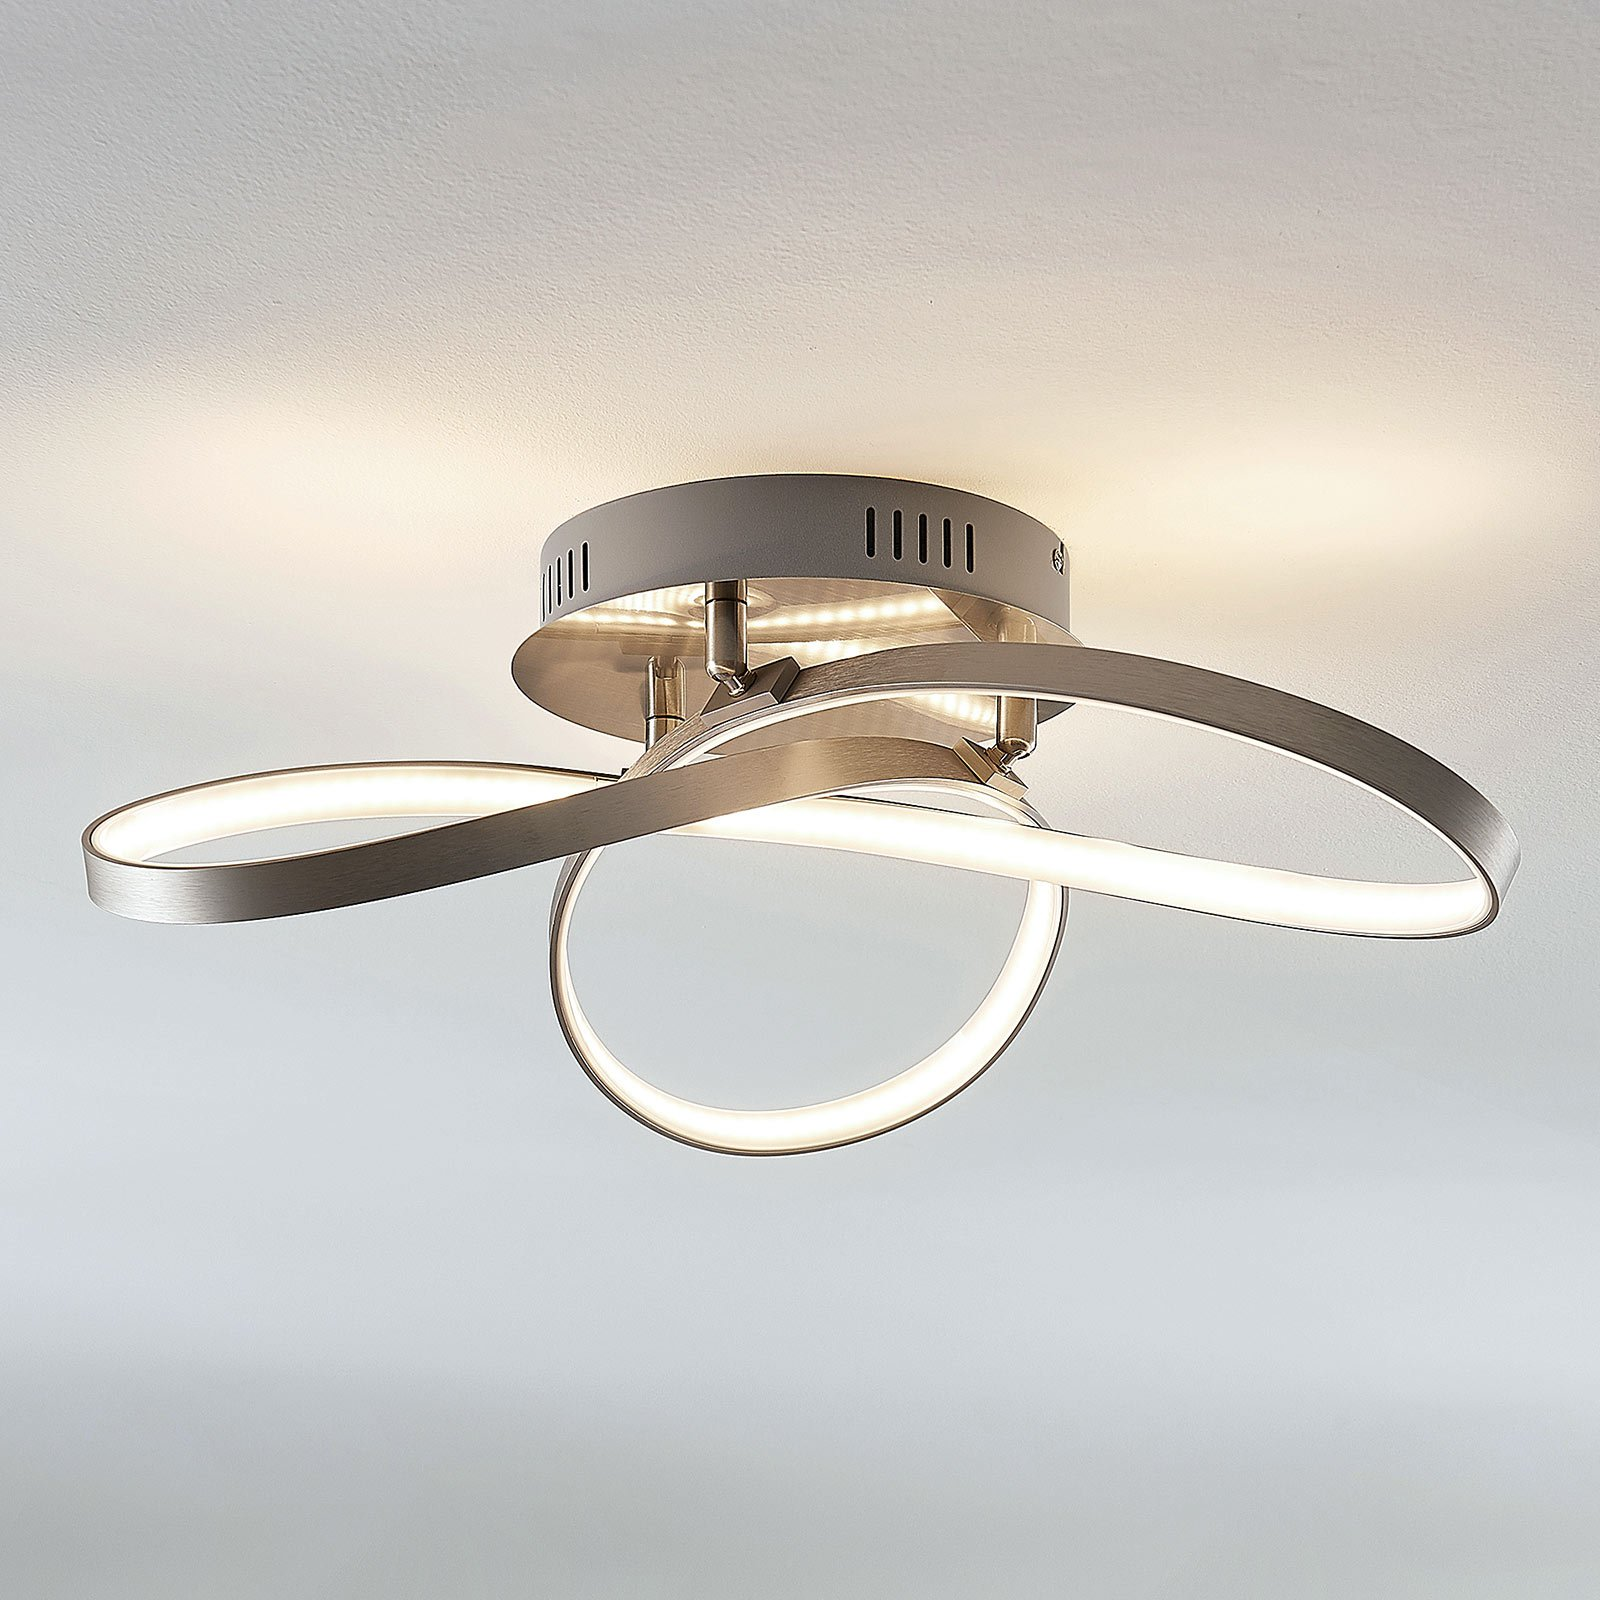 LED-taklampe Saliha med moderne utforming